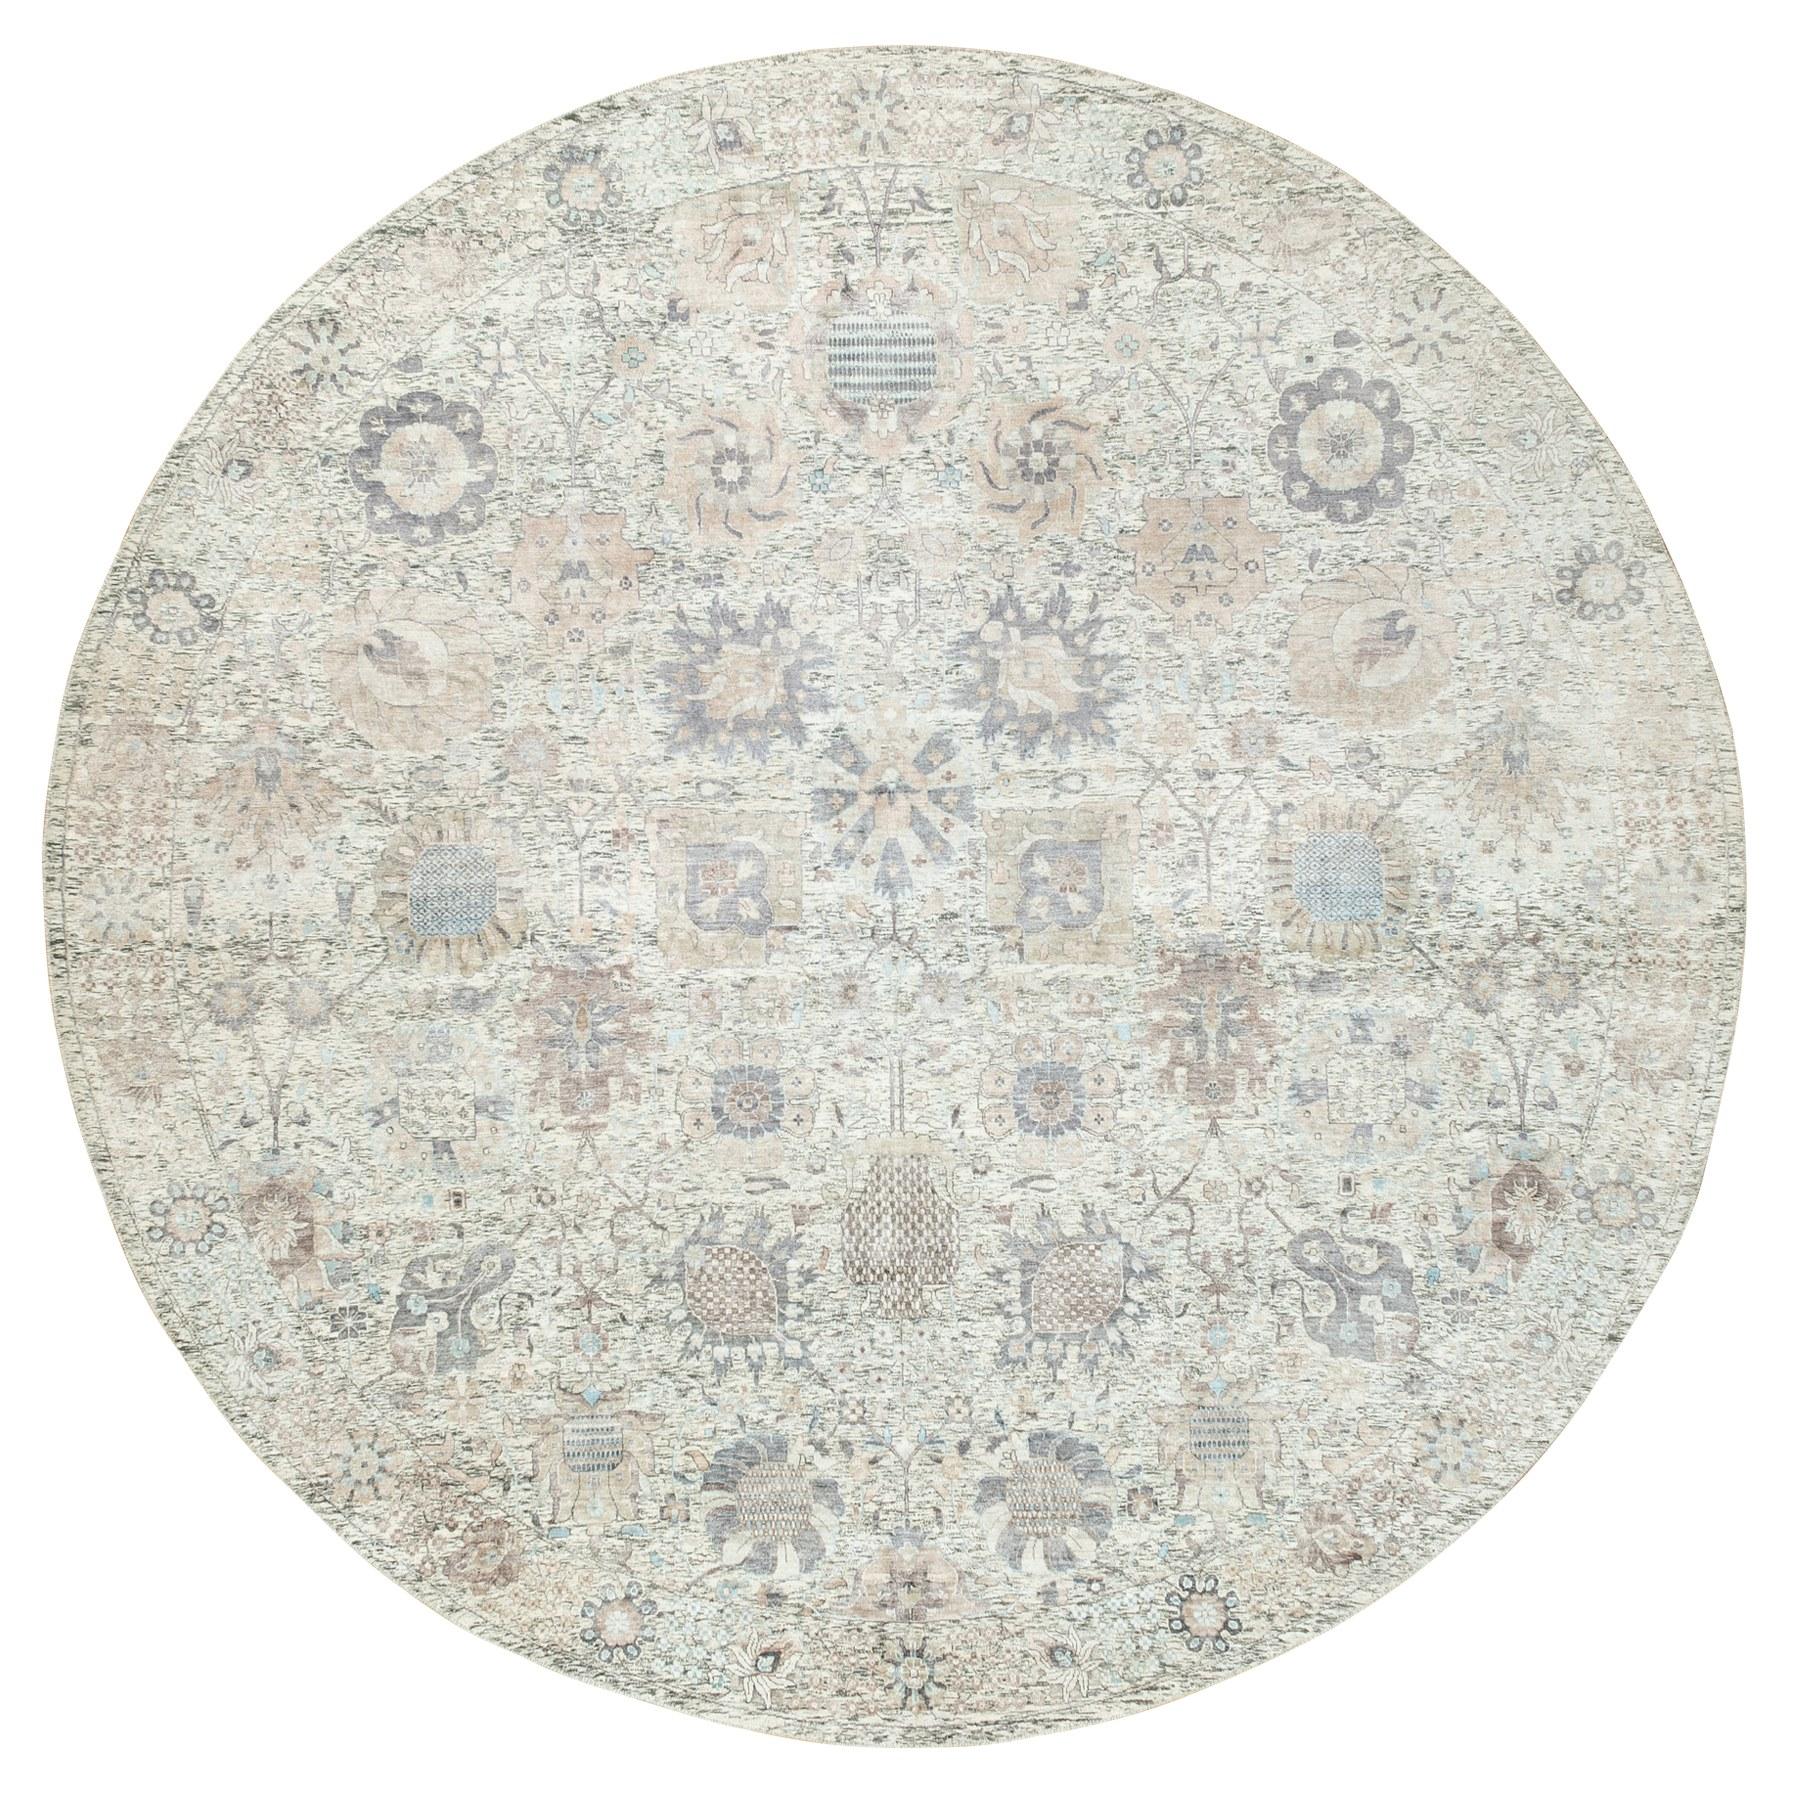 "11'10""x11'10"" Ivory Silk With Textured Wool Tabriz Hand Knotted Oriental Round Rug"